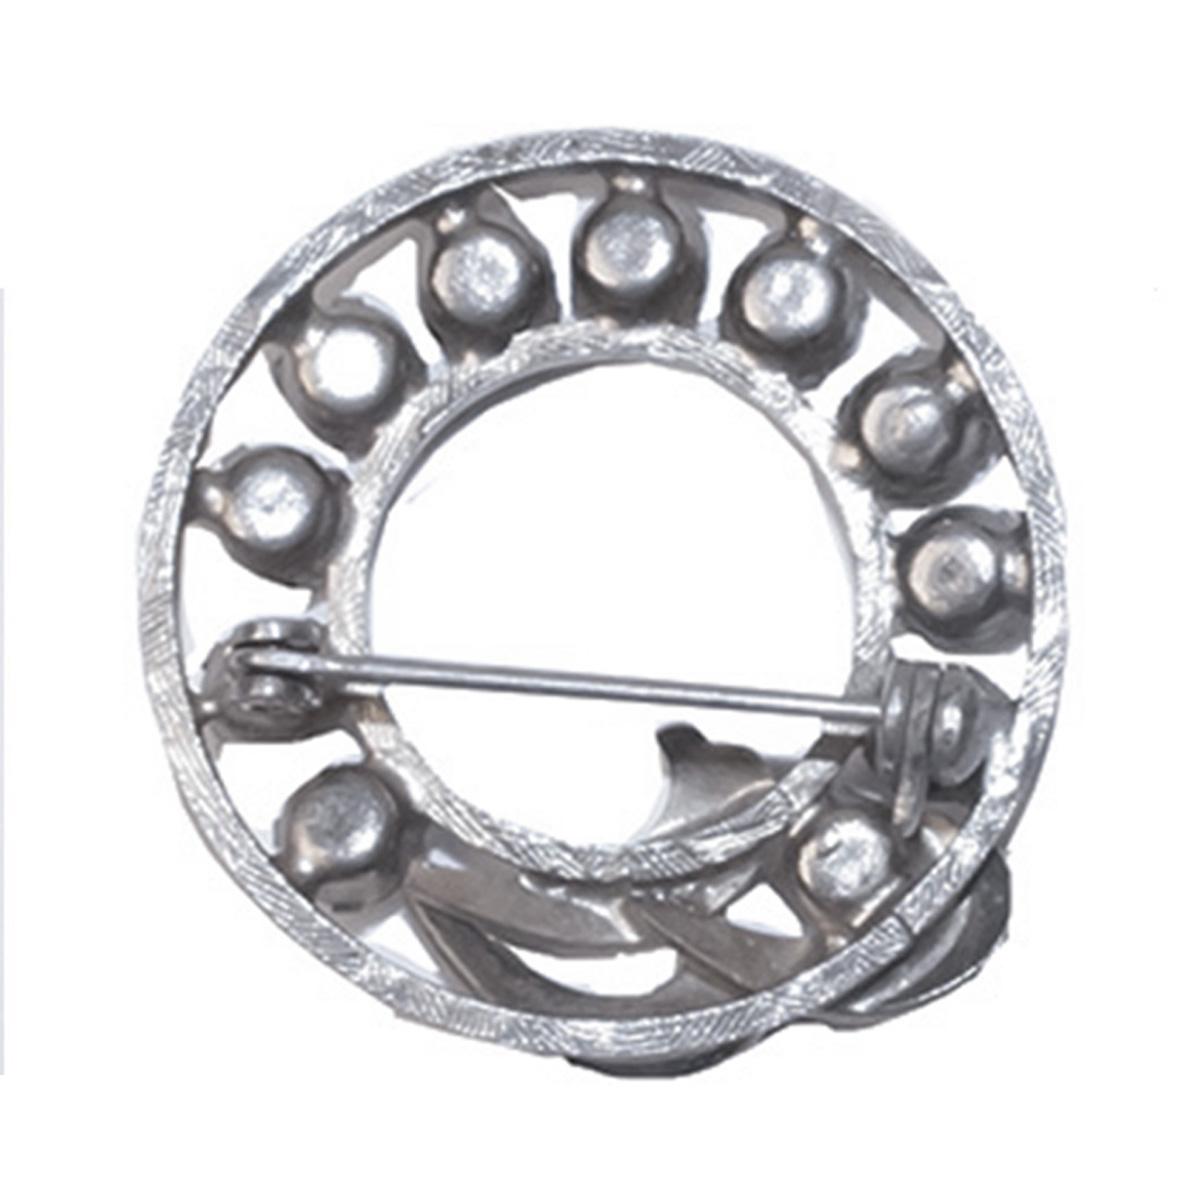 Silver wreath brooch